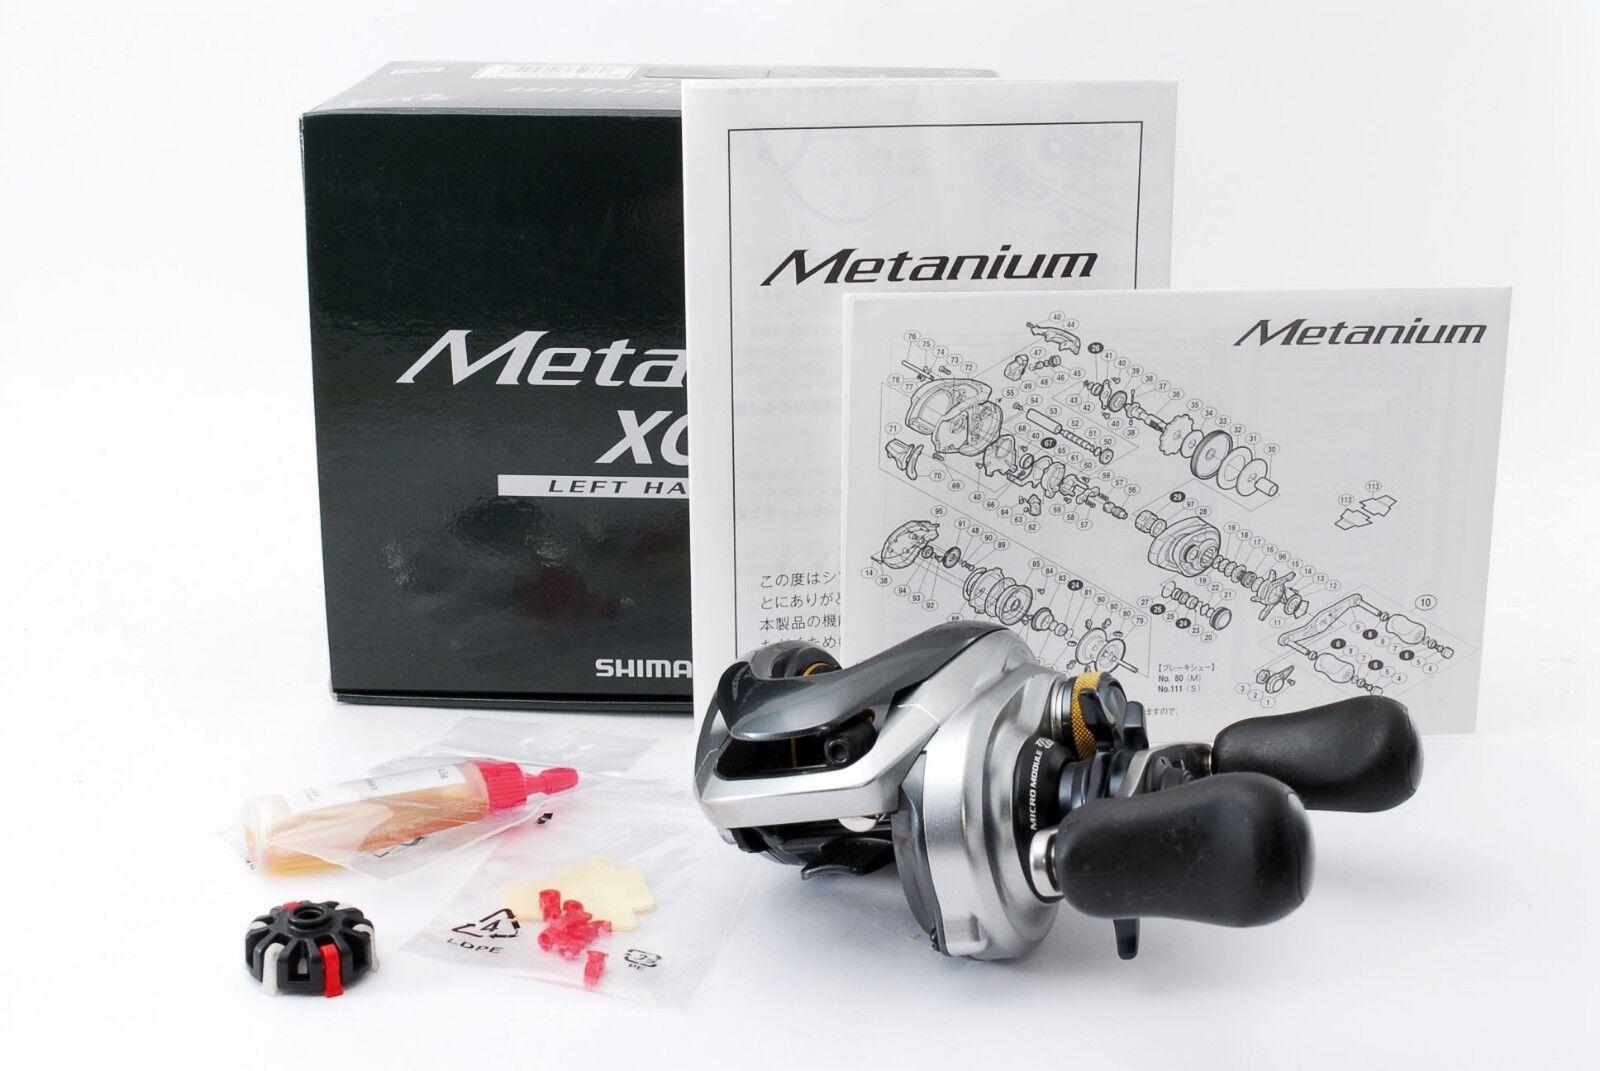 Shimano 13 Metanium XG Left Handle +Magnetic Brake from Japan【Excellent】